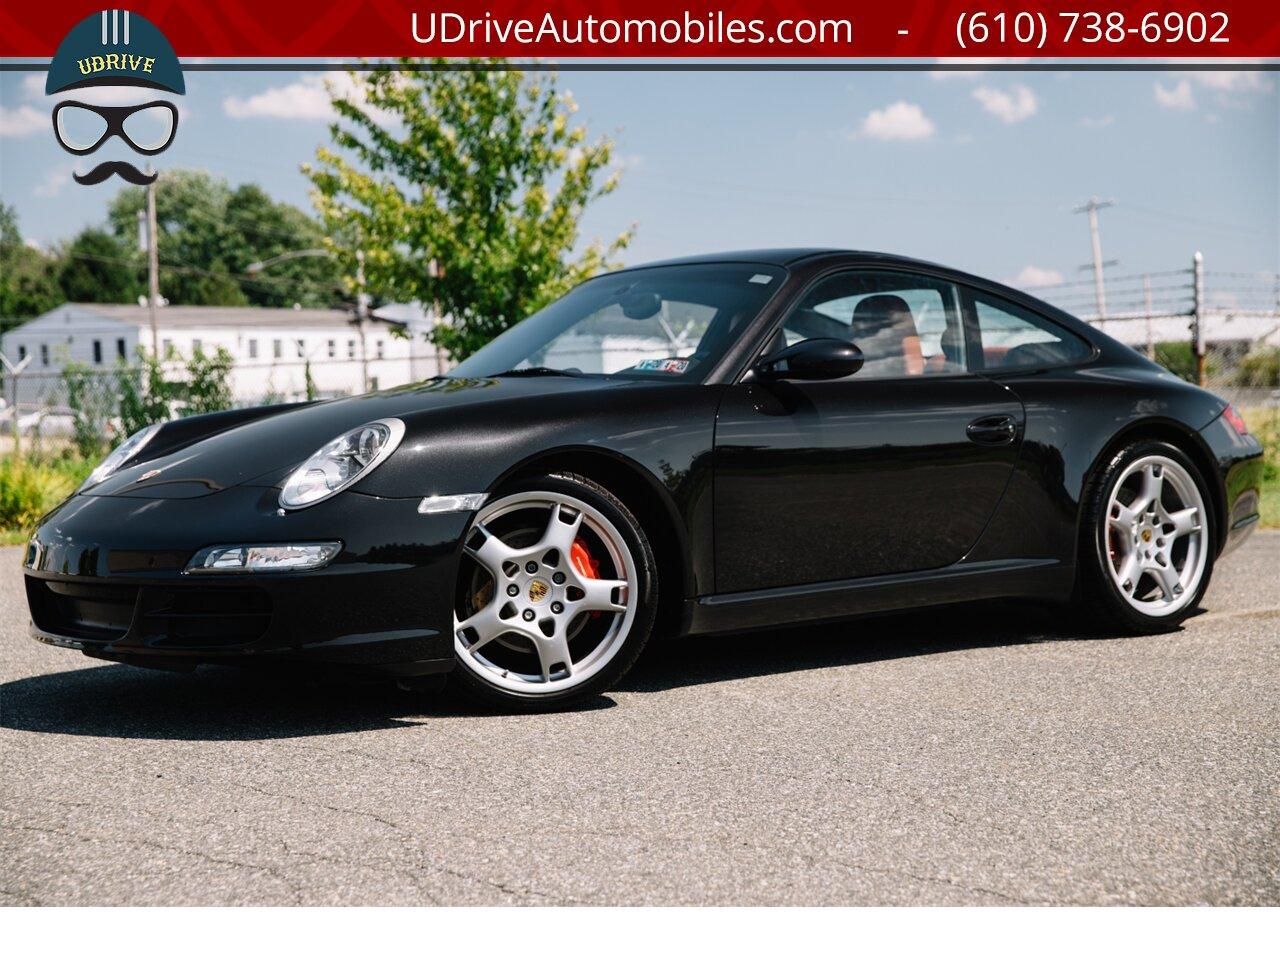 2007 Porsche 911 997S 6Sp Chrono Sprt Seats Sprt Shift Sprt